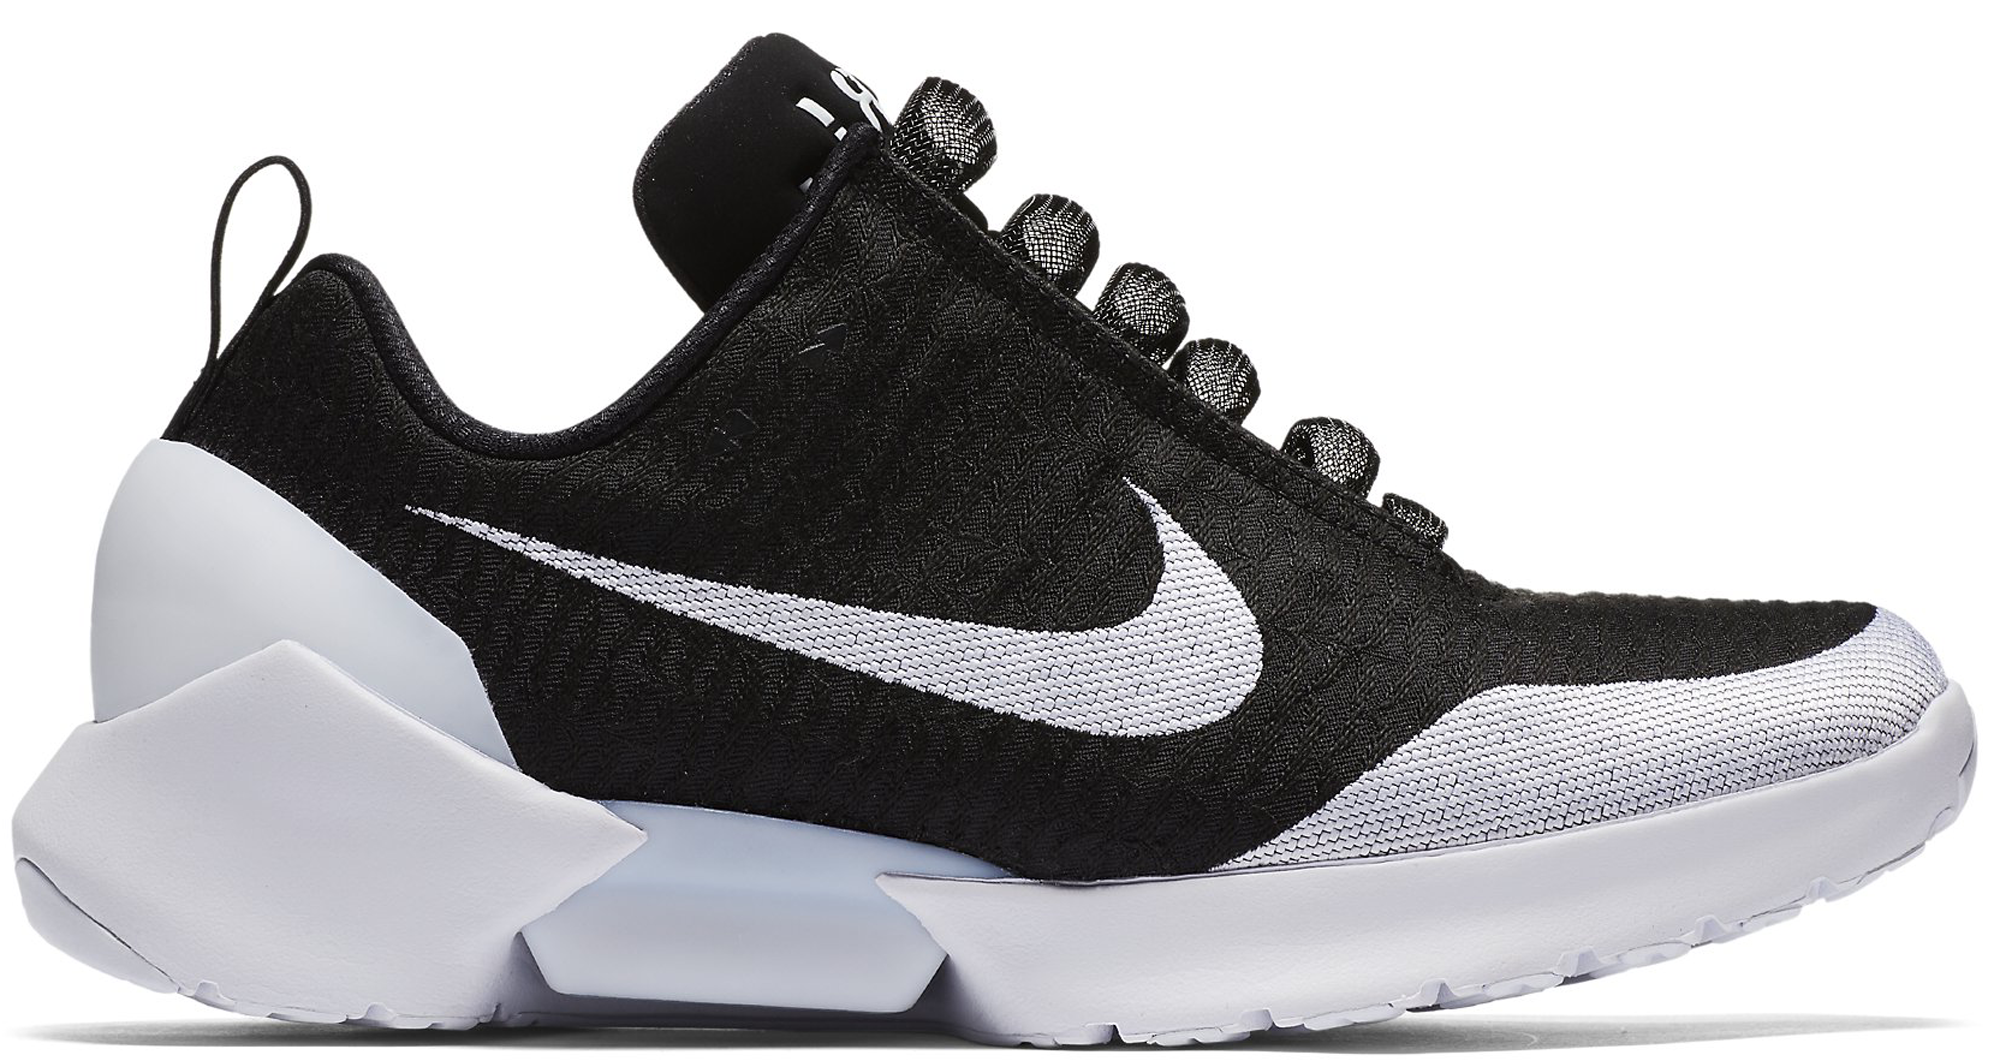 Nike HyperAdapt 1.0 Black White